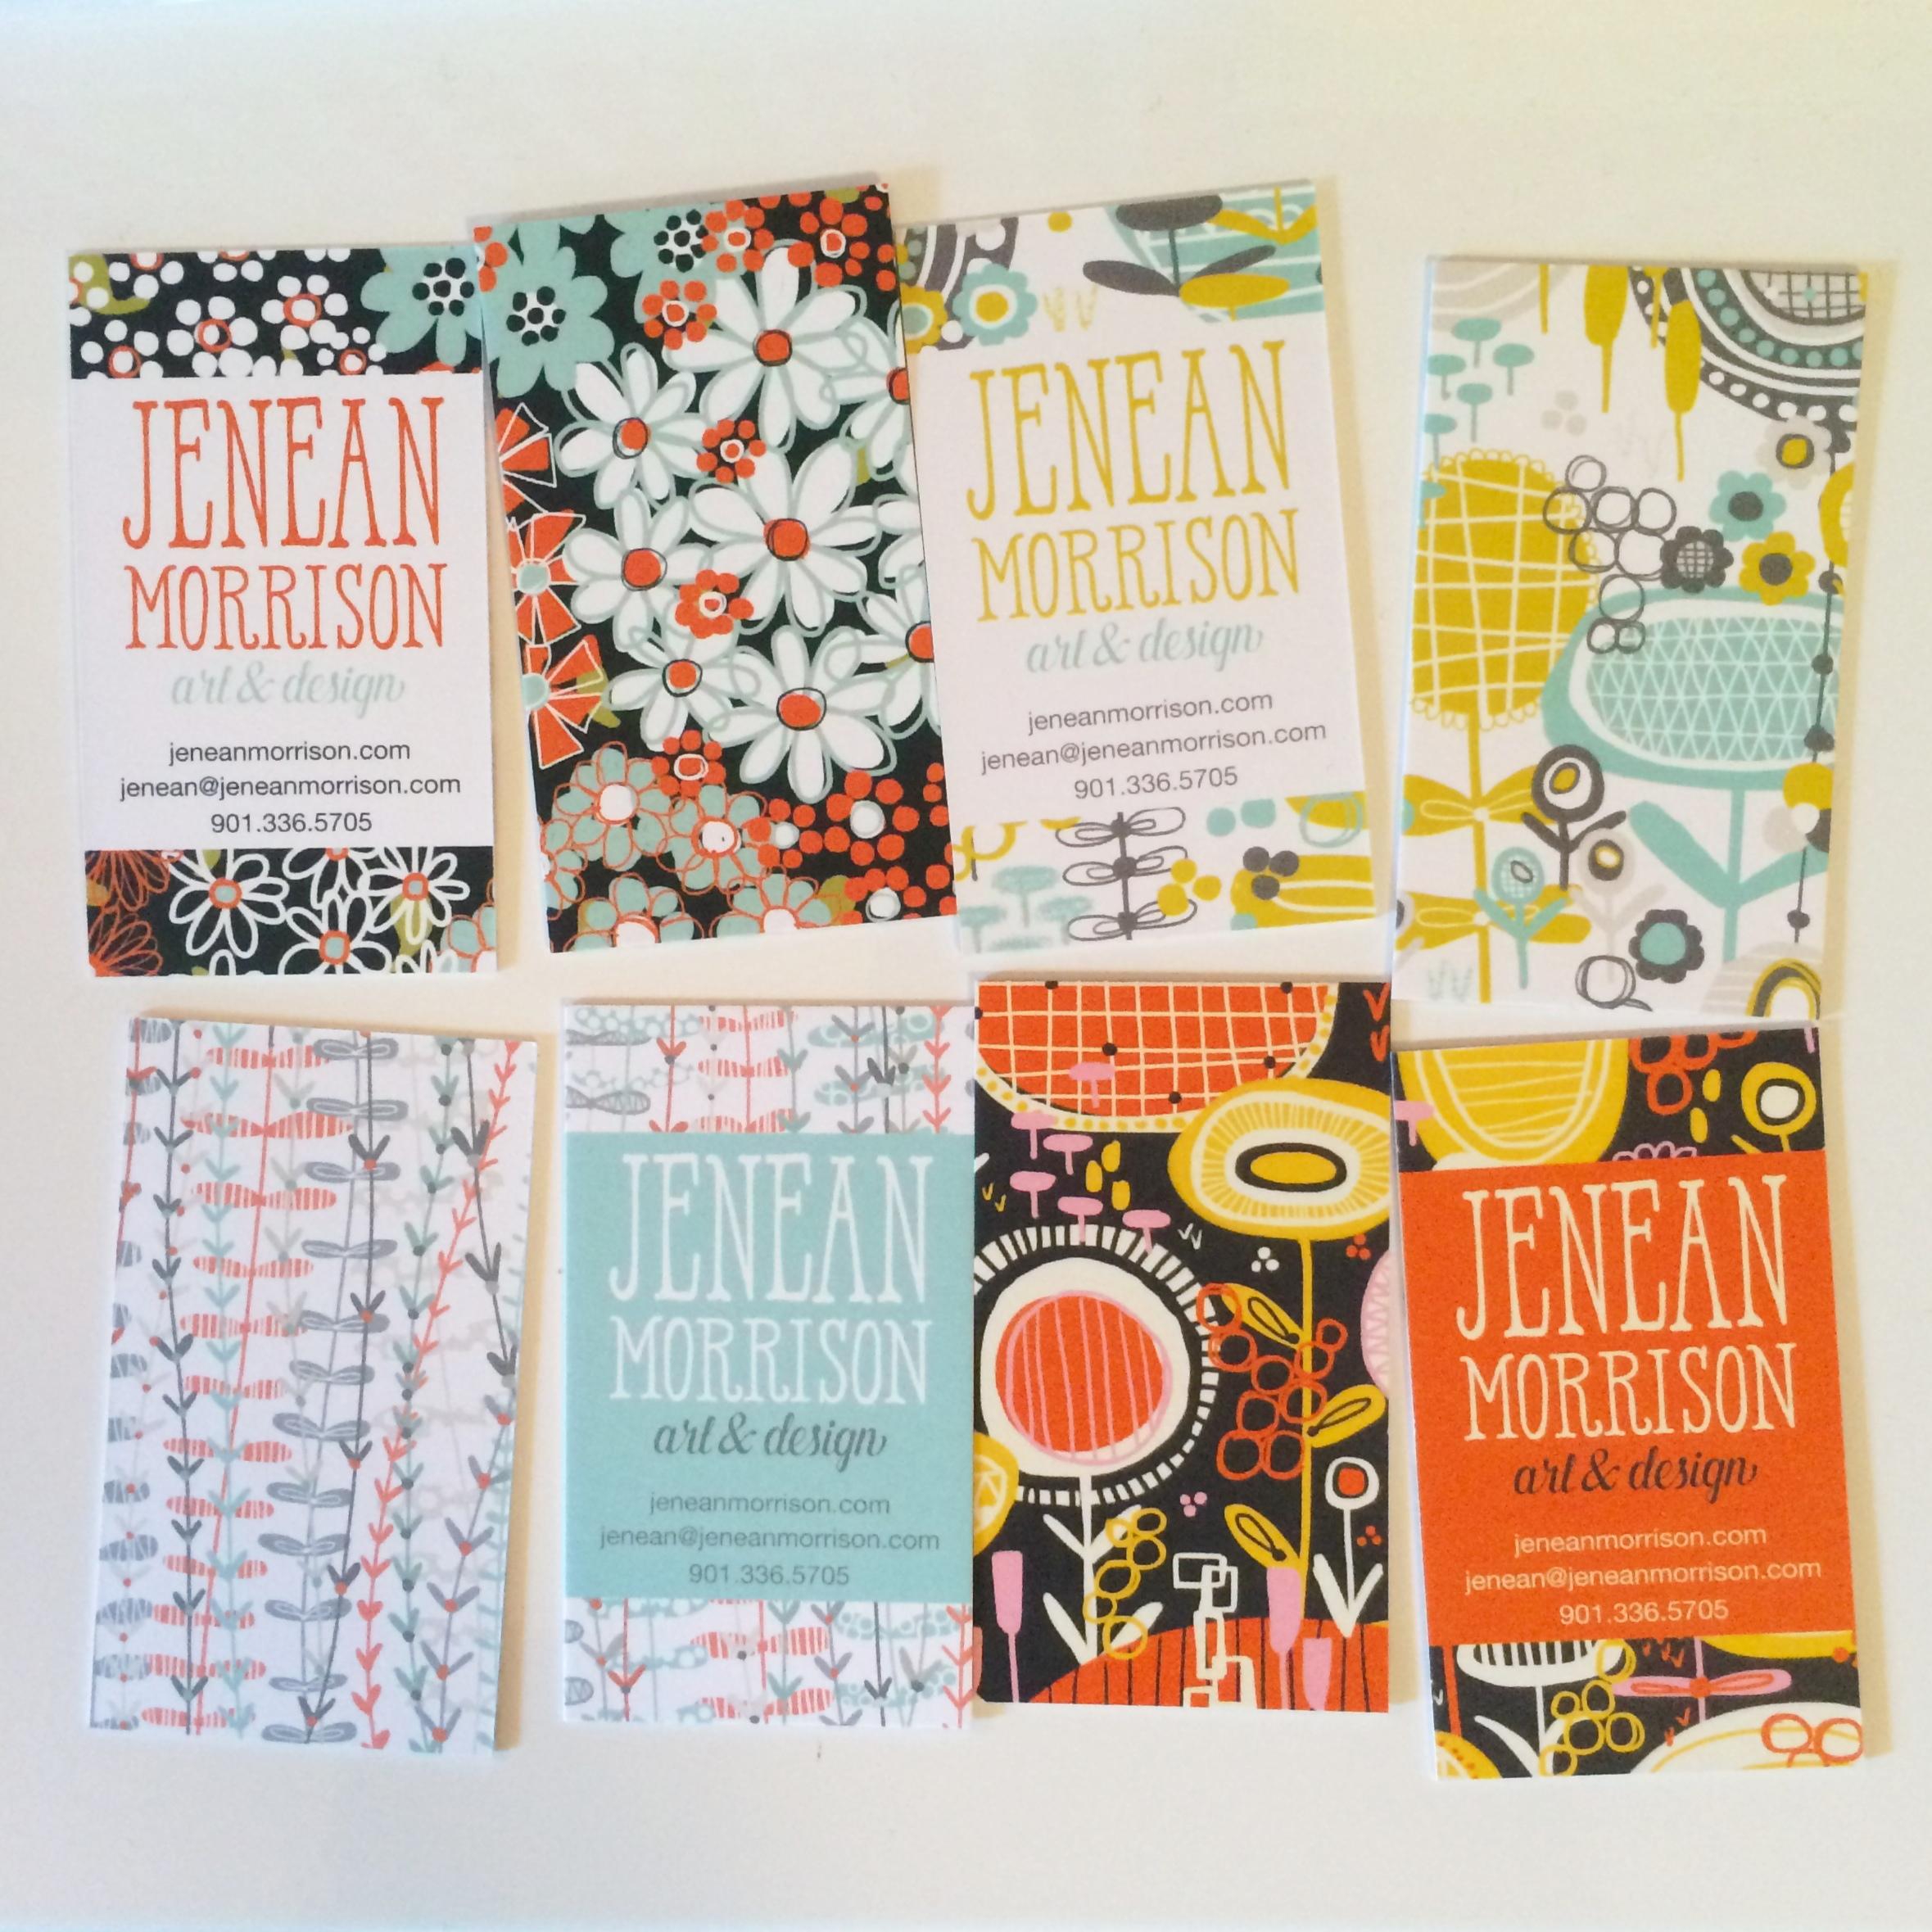 Jenean Morrison Business Cards